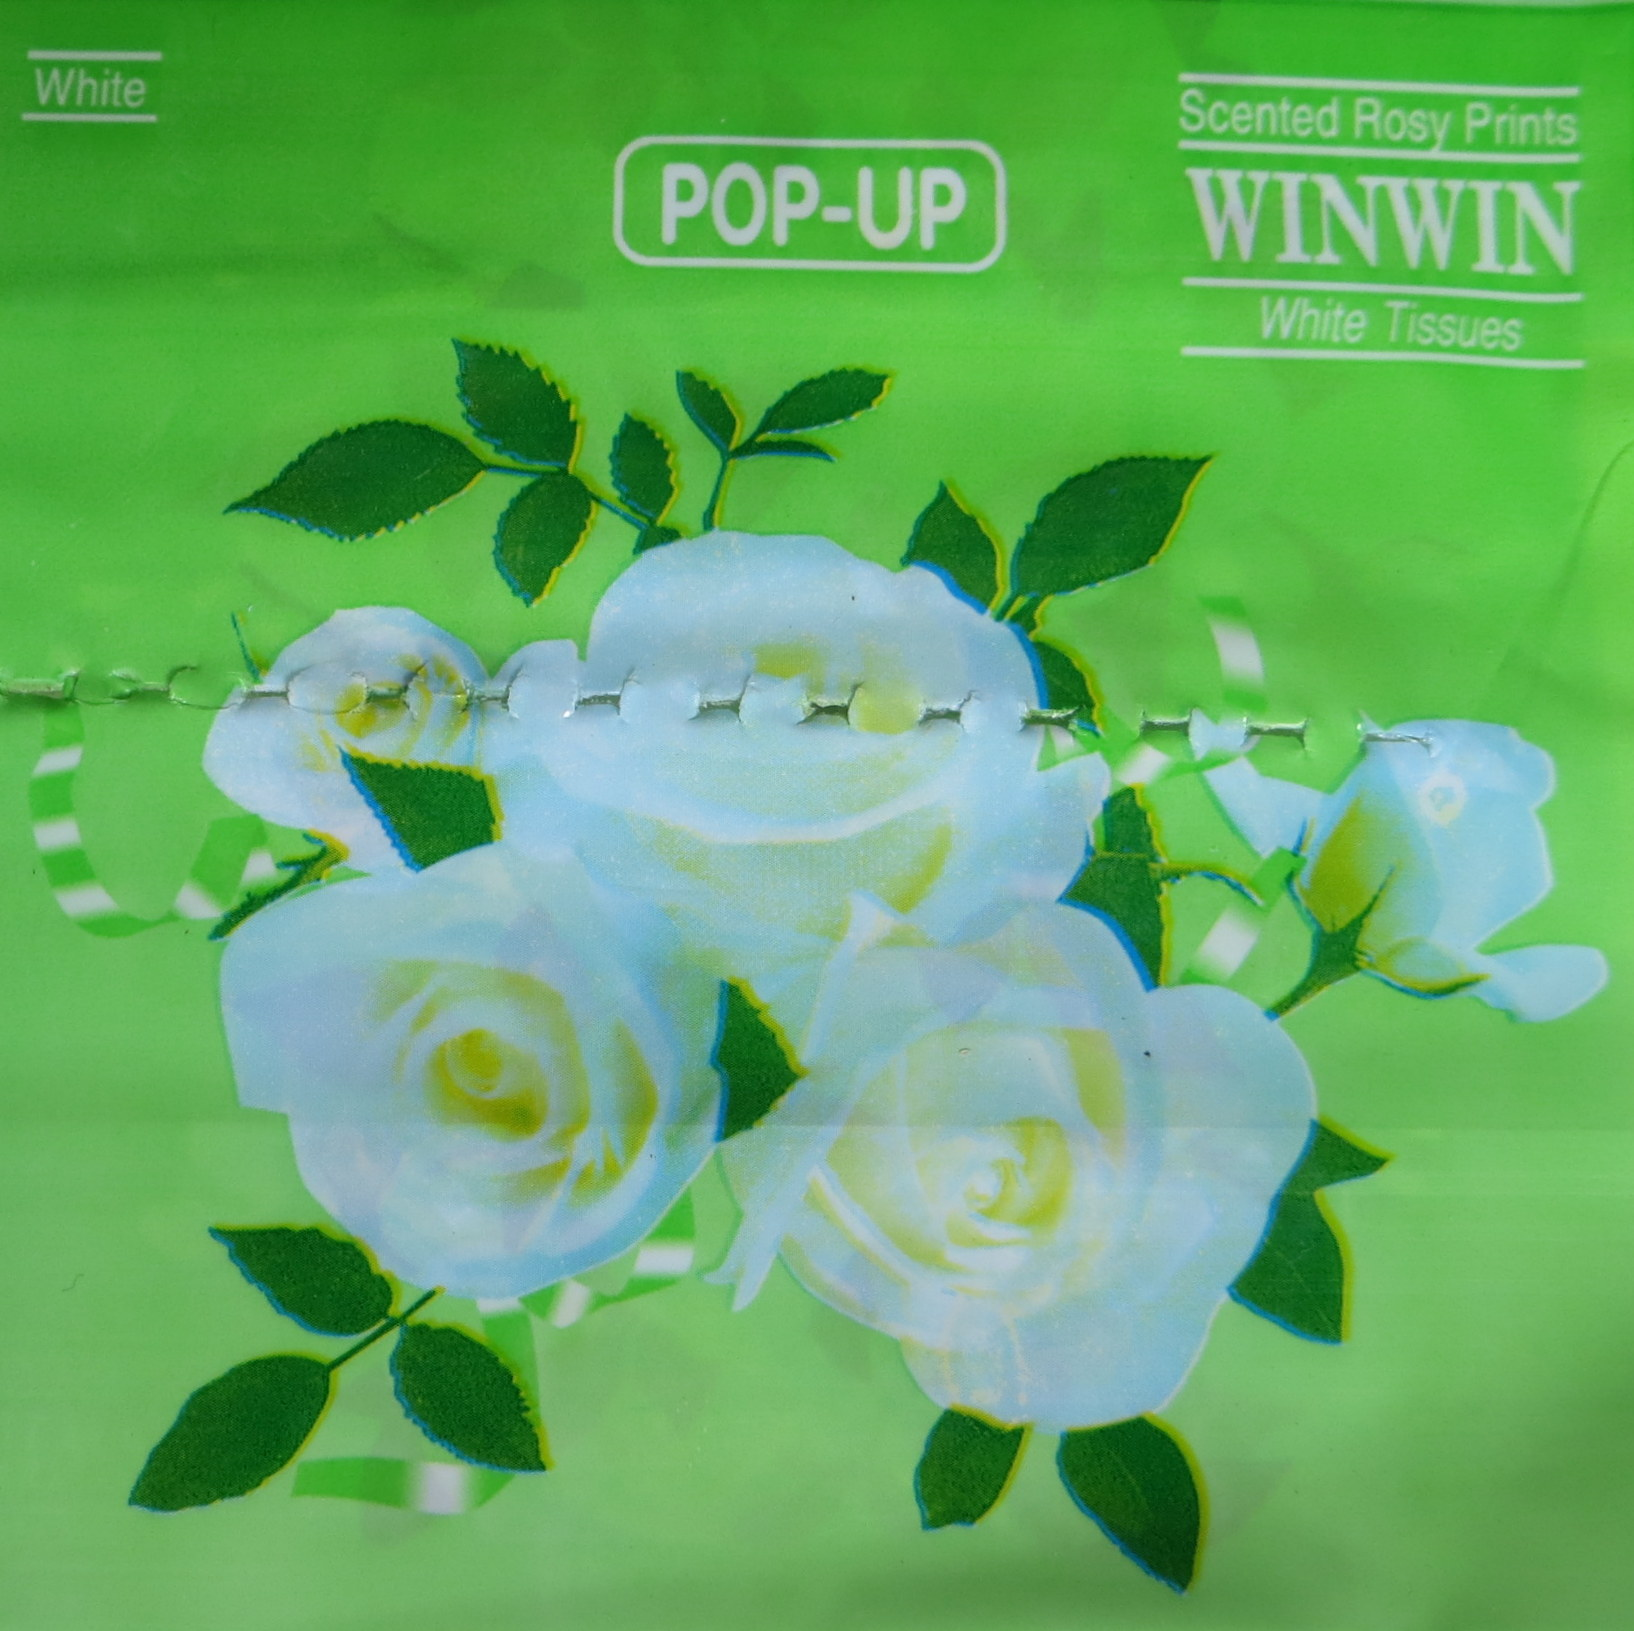 Khăn Pop-up Winwin Xanh